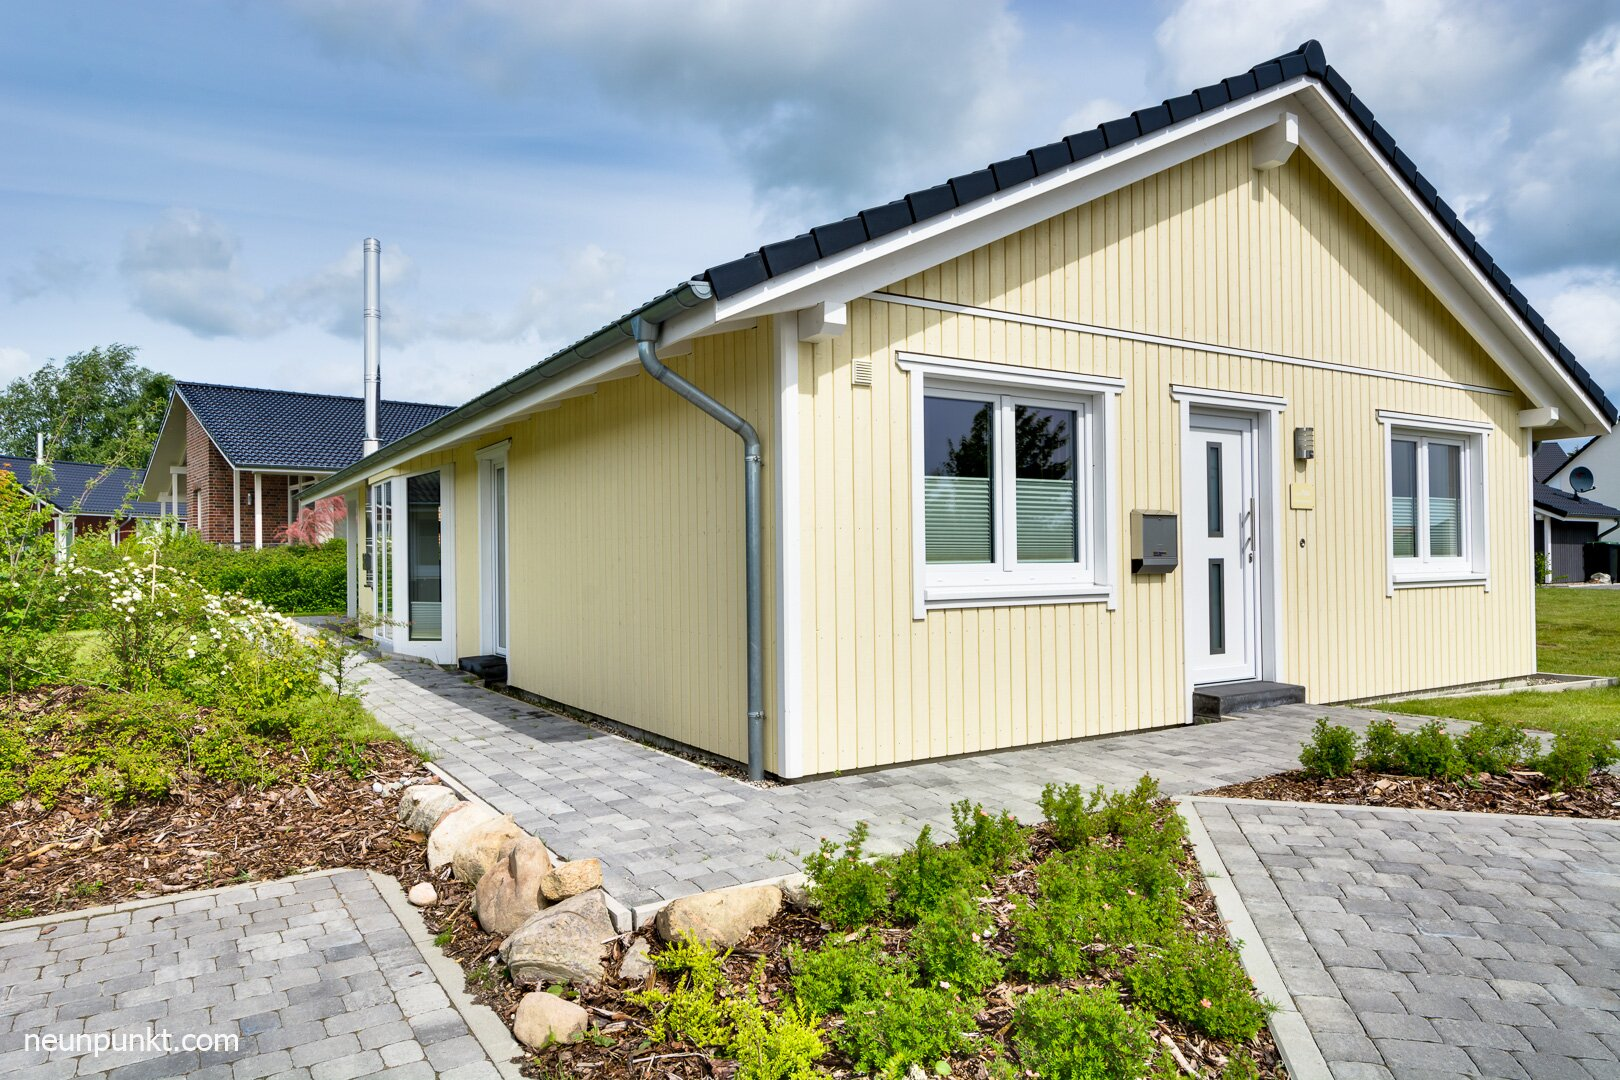 ferienhaus palu kf4a in kappeln kopperby schleswig holstein winkels. Black Bedroom Furniture Sets. Home Design Ideas